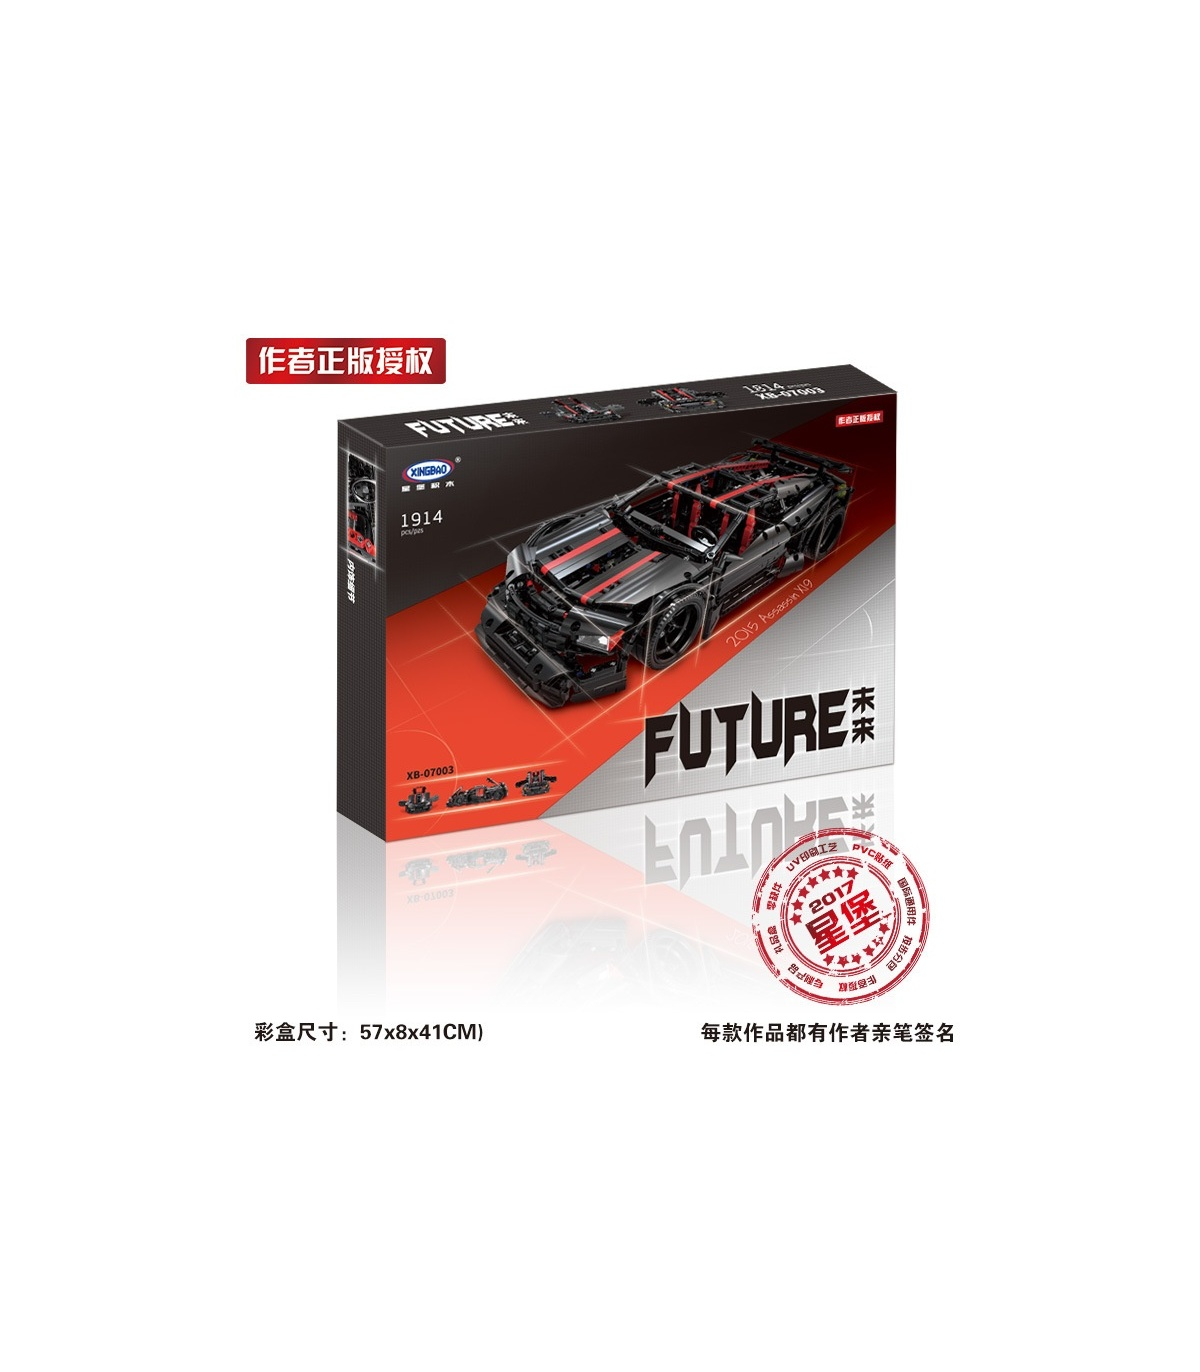 XINGBAO07003アサシンX-19今後のお車のブ玩具セット